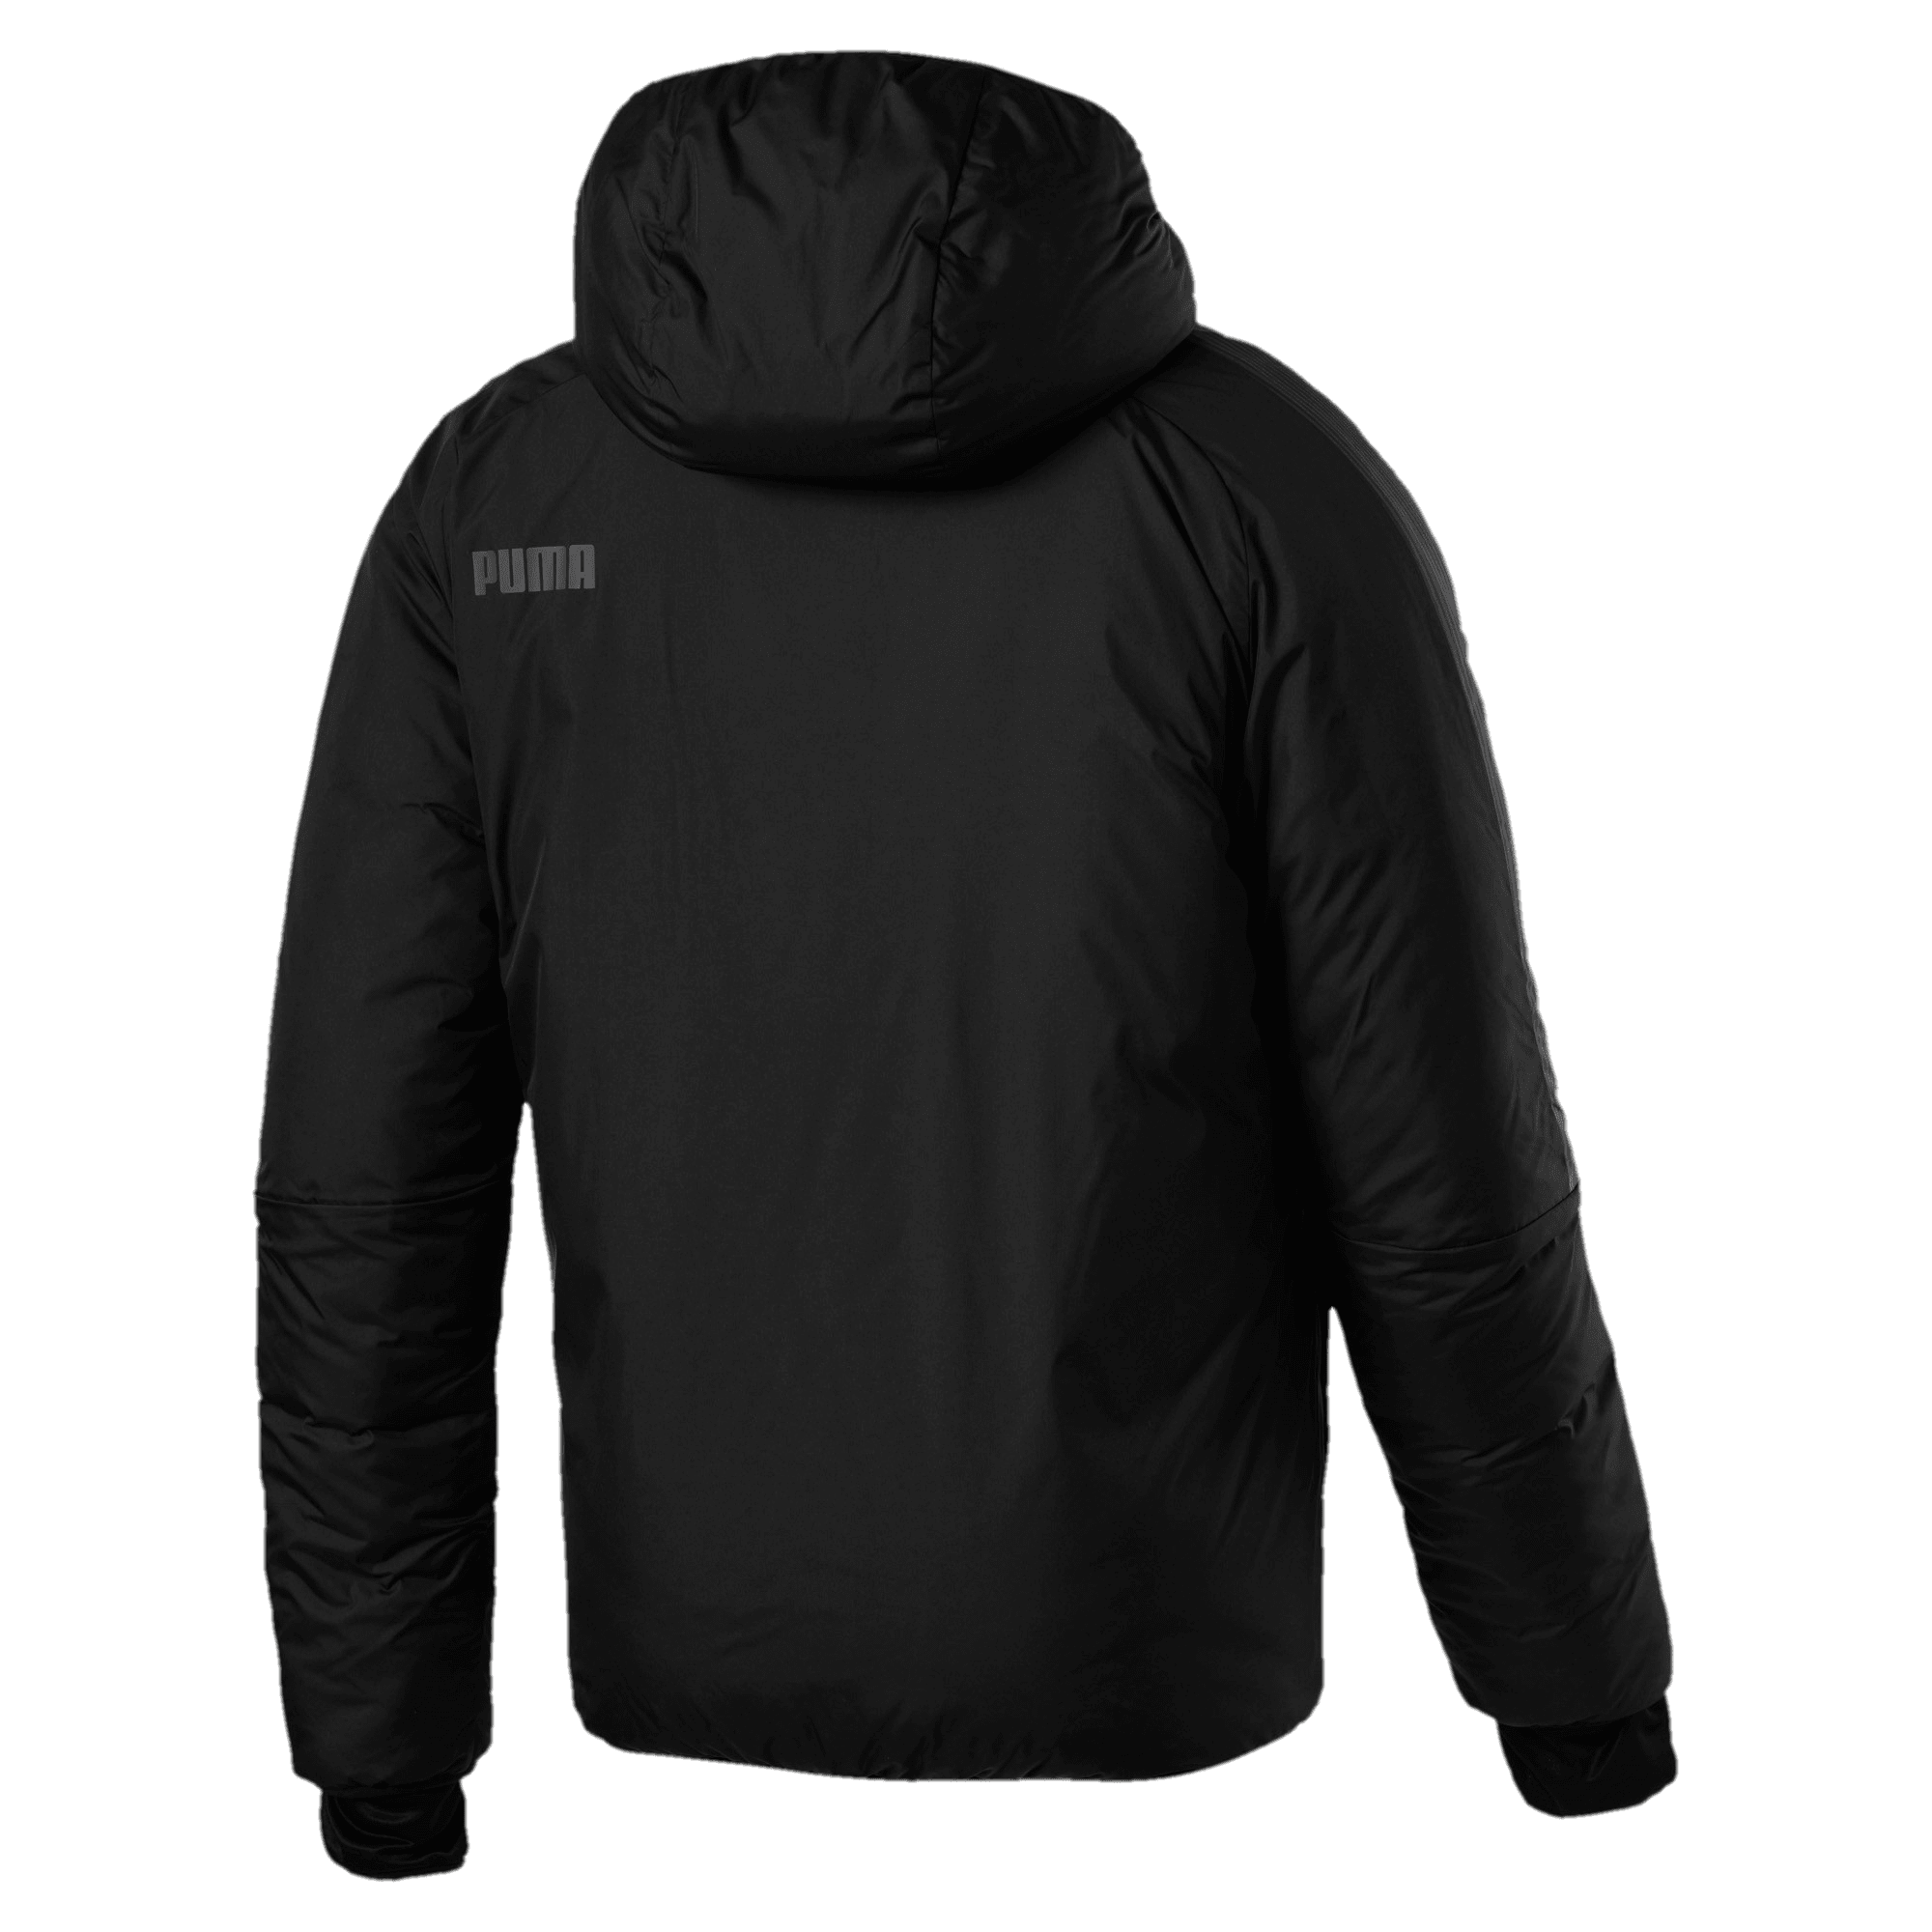 Thumbnail 3 of PWRWarm Men's Jacket, Puma Black, medium